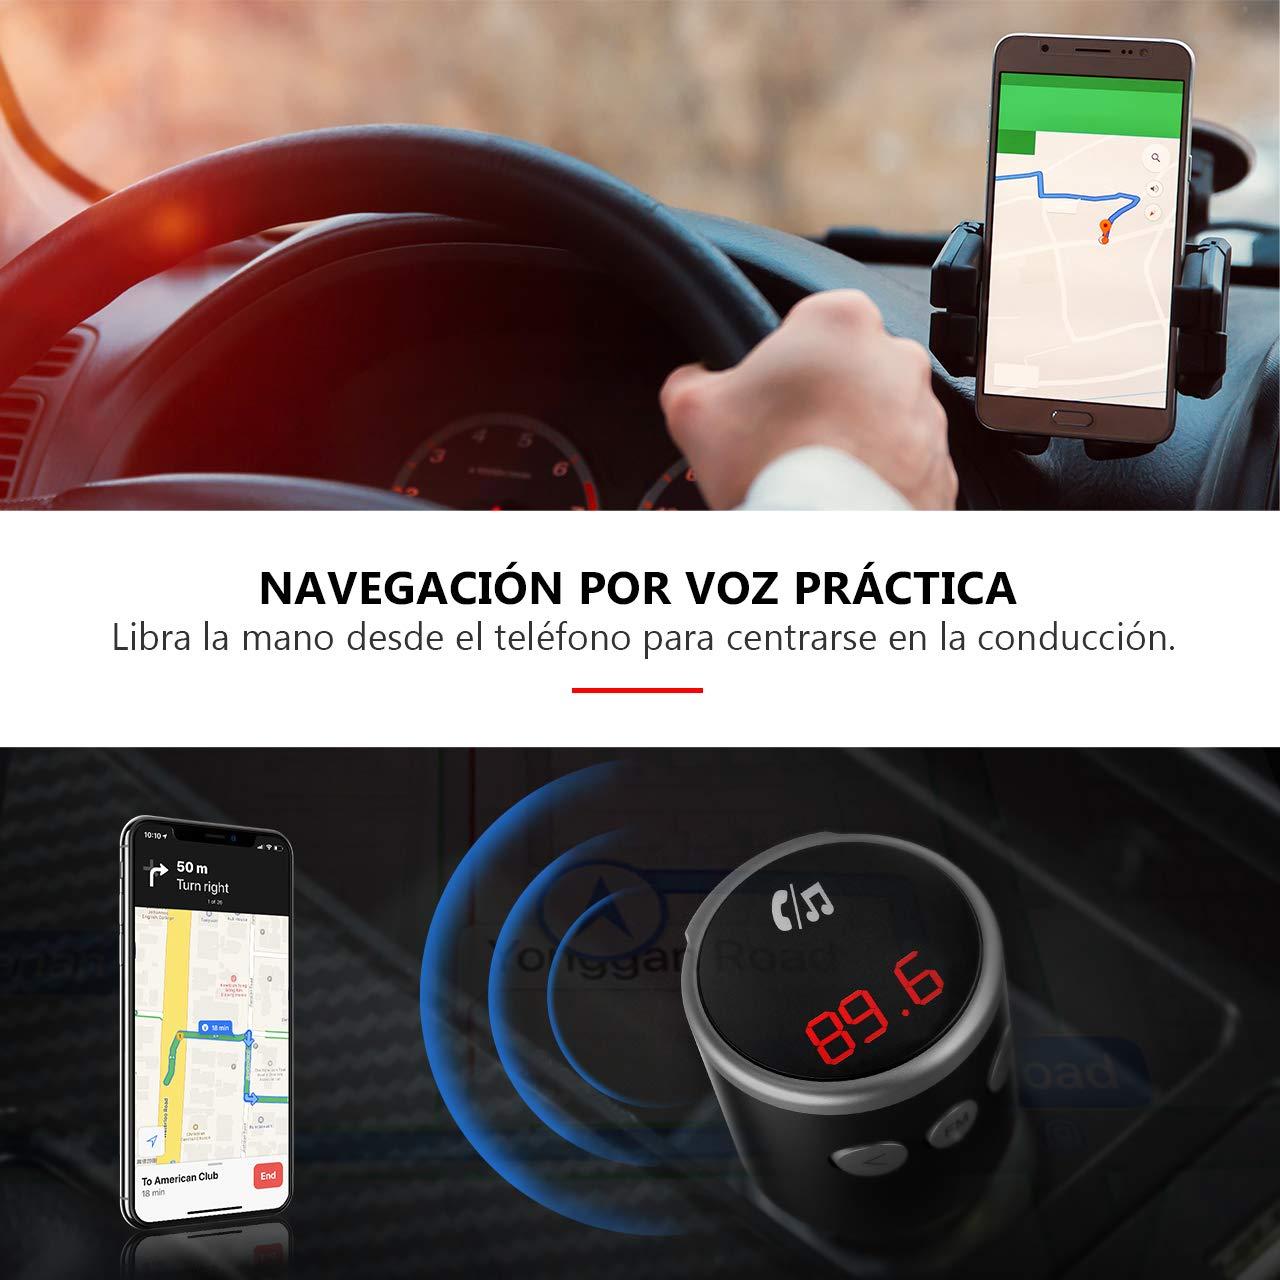 Victsing transmisor manos libres Bluetooth para Coche Adaptador de Radio Inal/ámbrico Bluetooth 4.2 QC3.0 Dual Cargador USB Mini Transmisor fm coche Bluetooth Mp3 Reproductor M/úsica para iOS//Androi